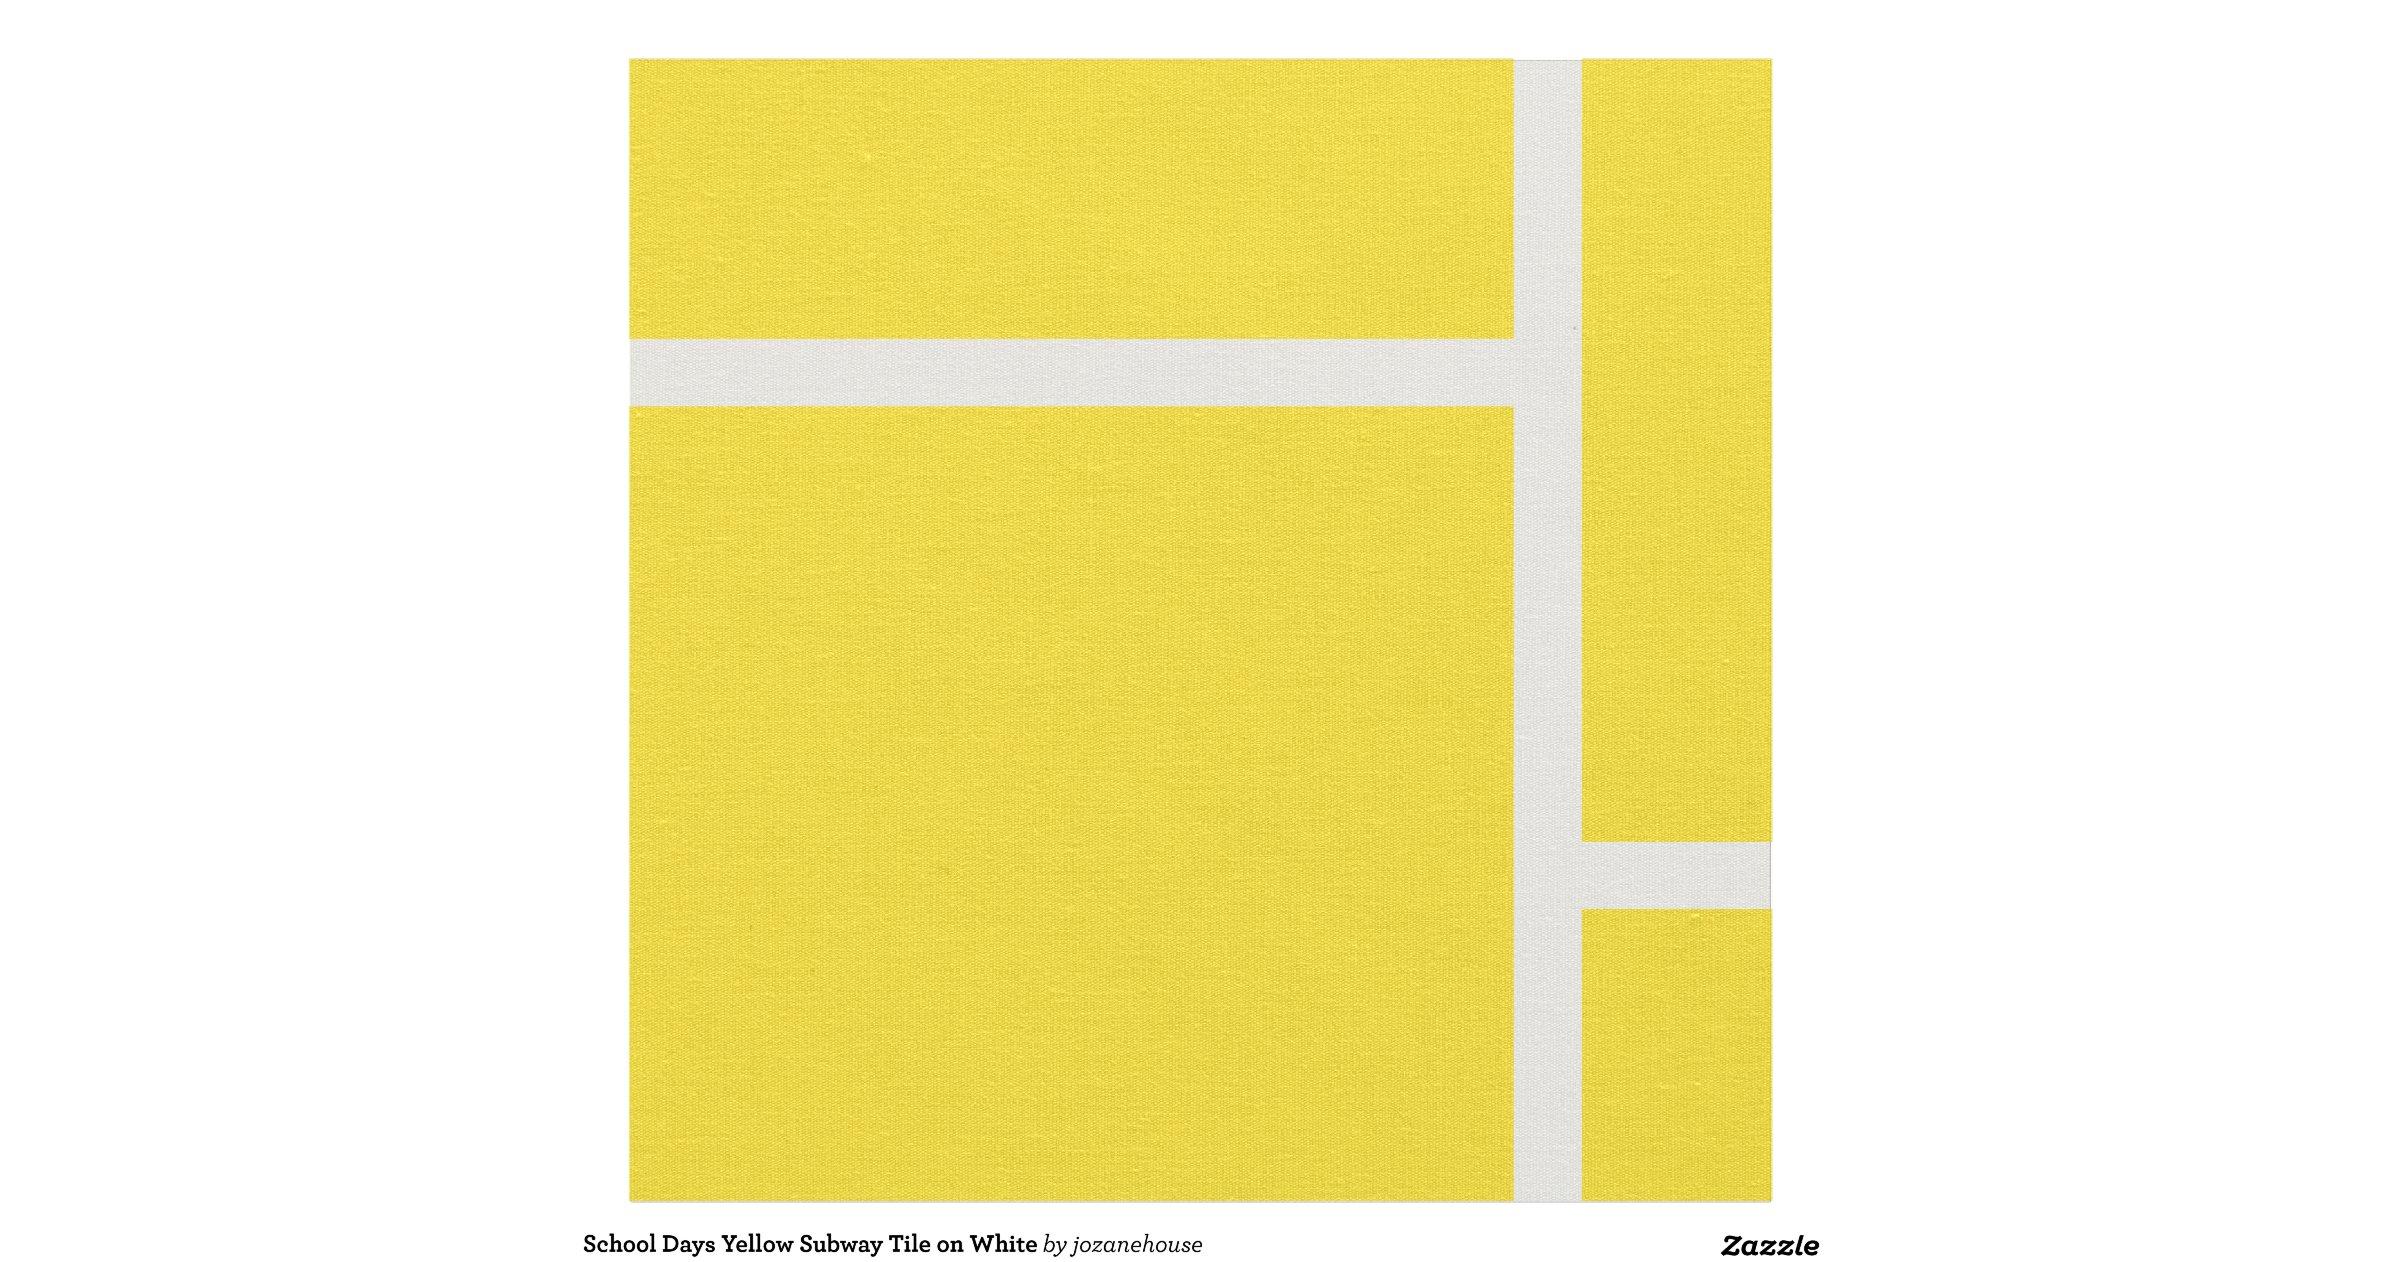 school days yellow subway tile on white fabric